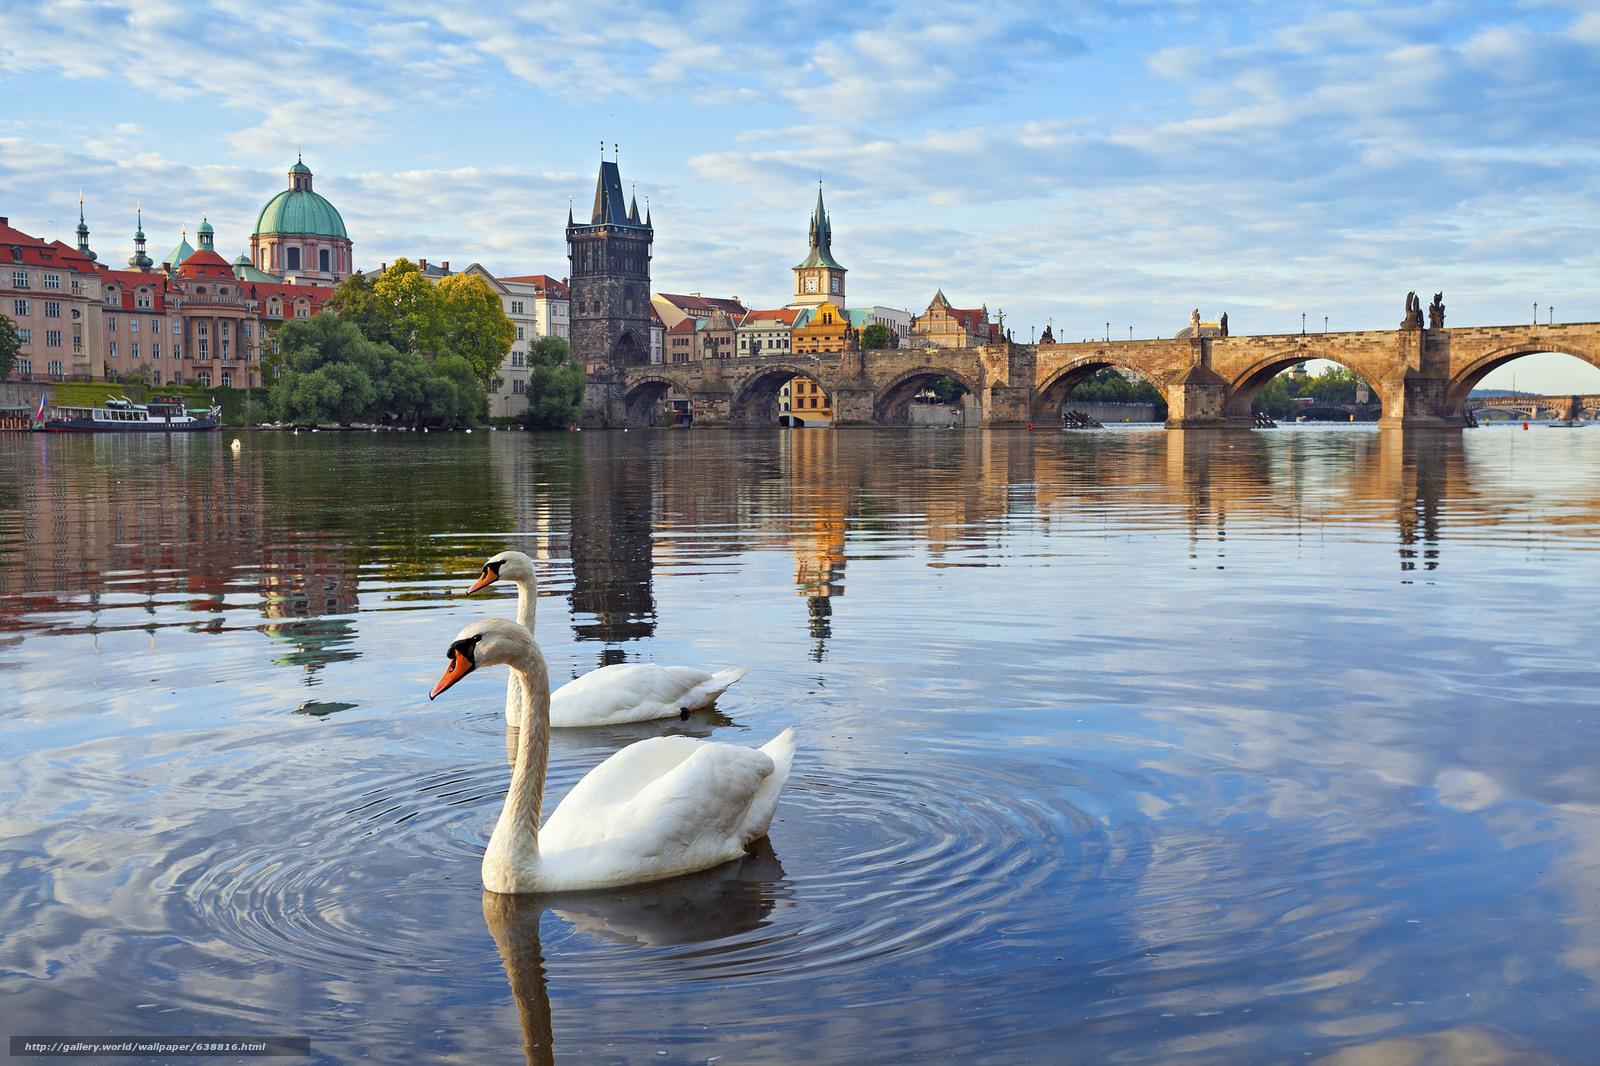 Download wallpaper : Czech Republic,  Prague,  Prague free desktop wallpaper in the resolution 2048x1365 — picture №638816